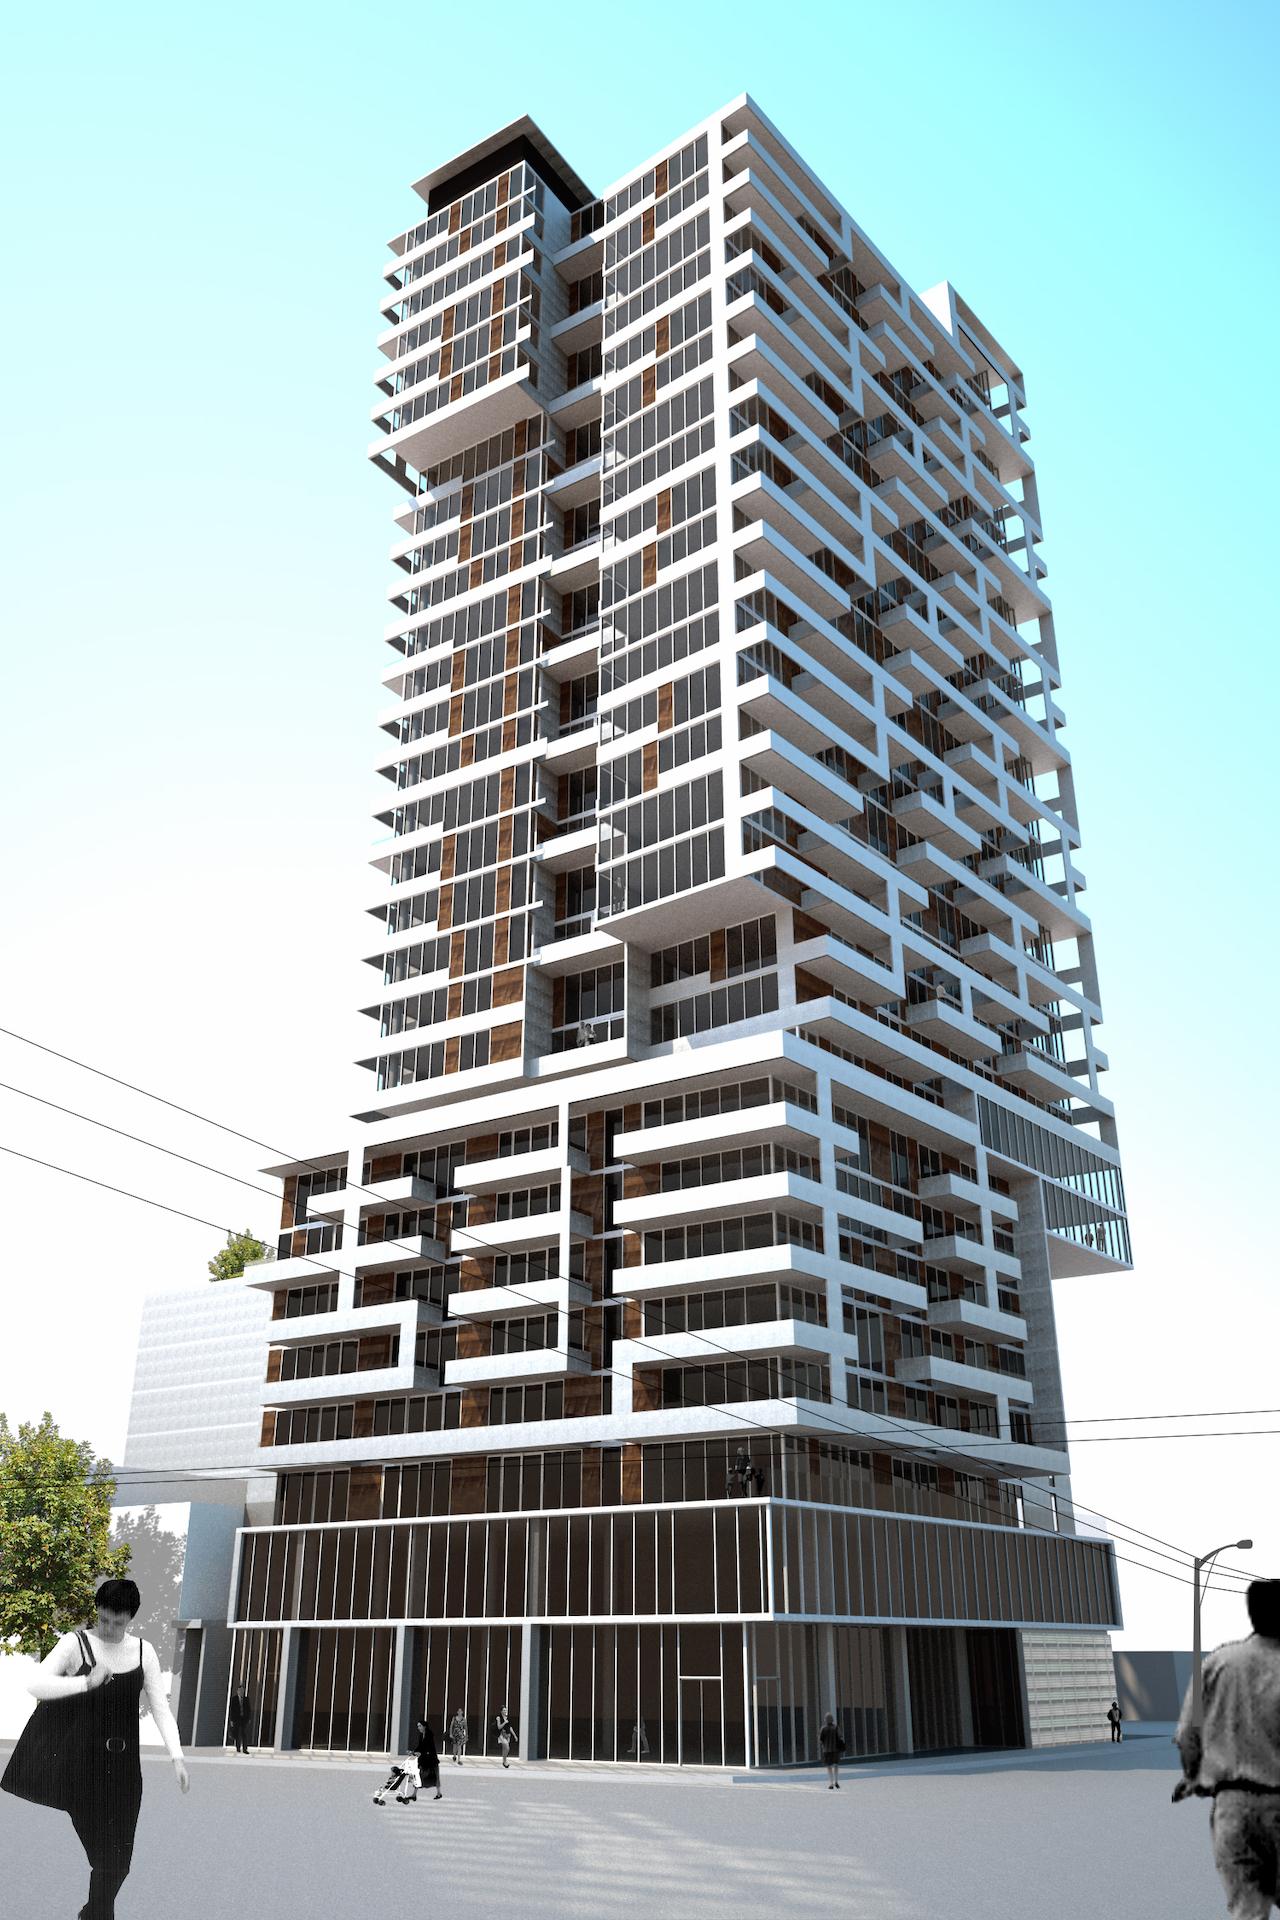 Giraffe Condos, Toronto, designed by Teeple Architects for TAS Design Build